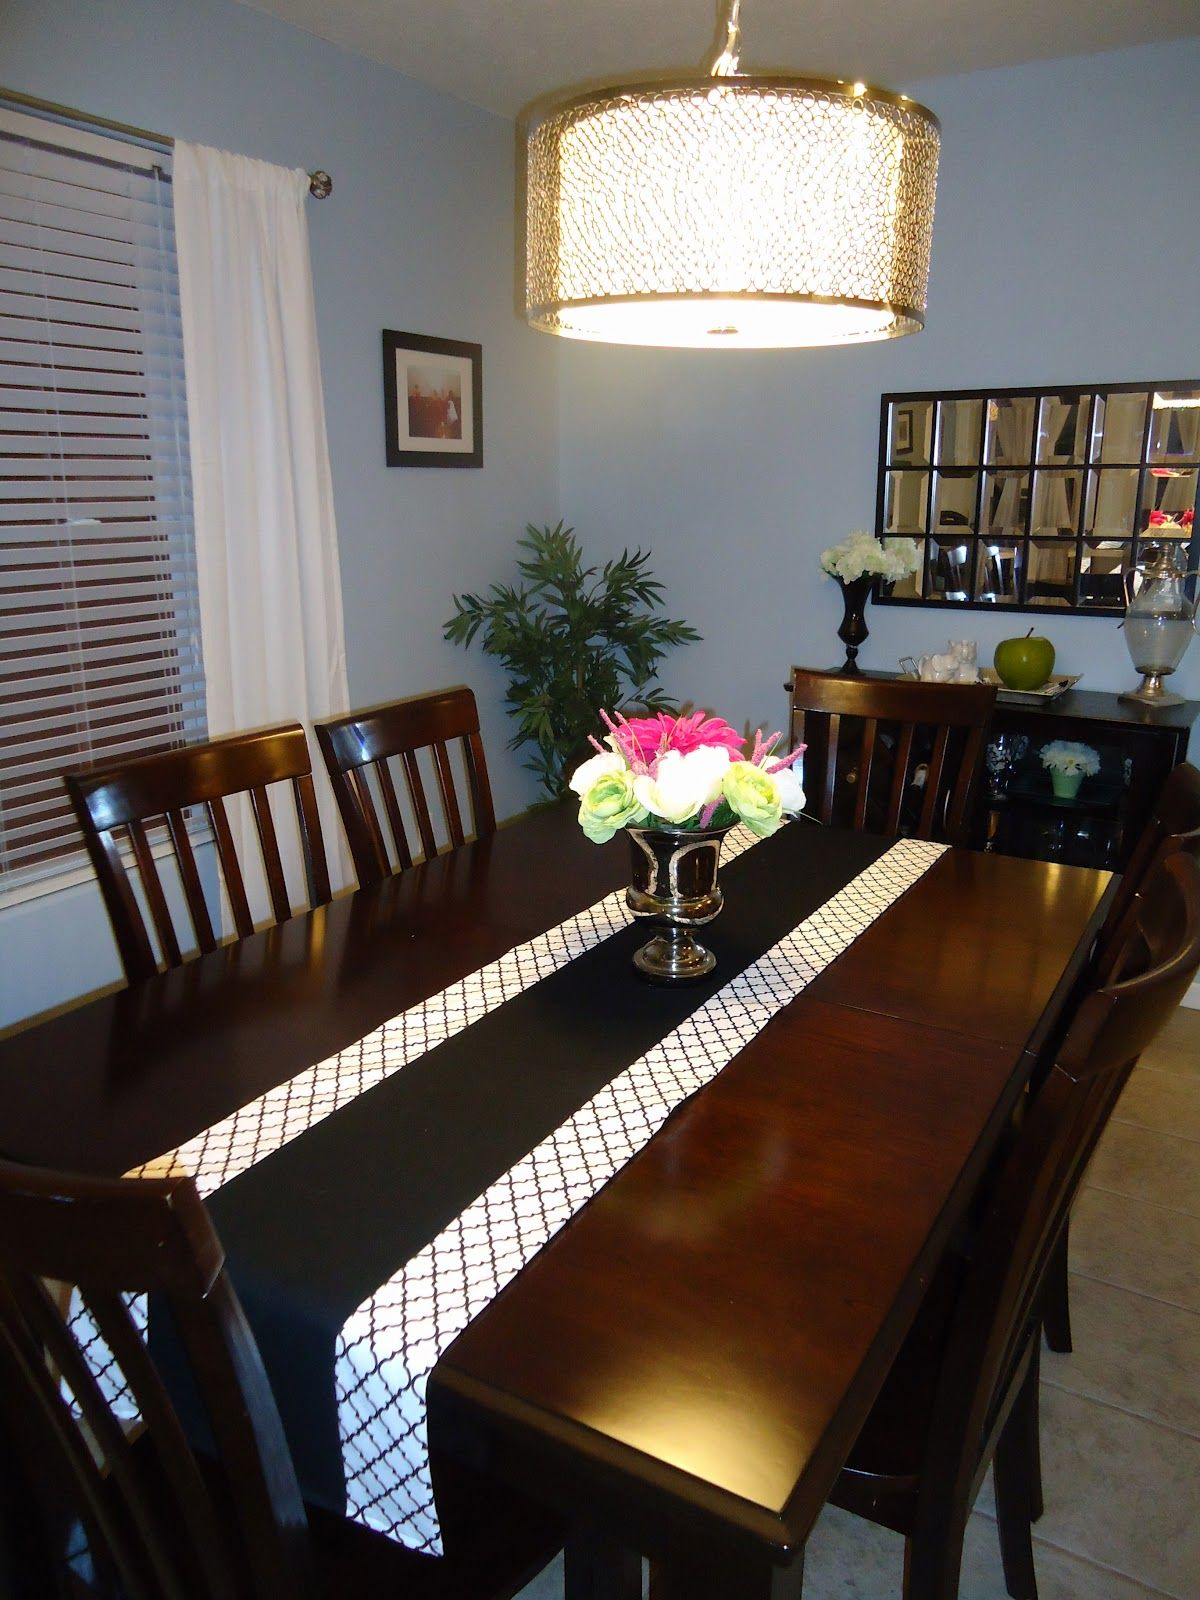 Raeleigh+7.JPG 7,7×7,7 pixels   Table runner diy, Dining ...